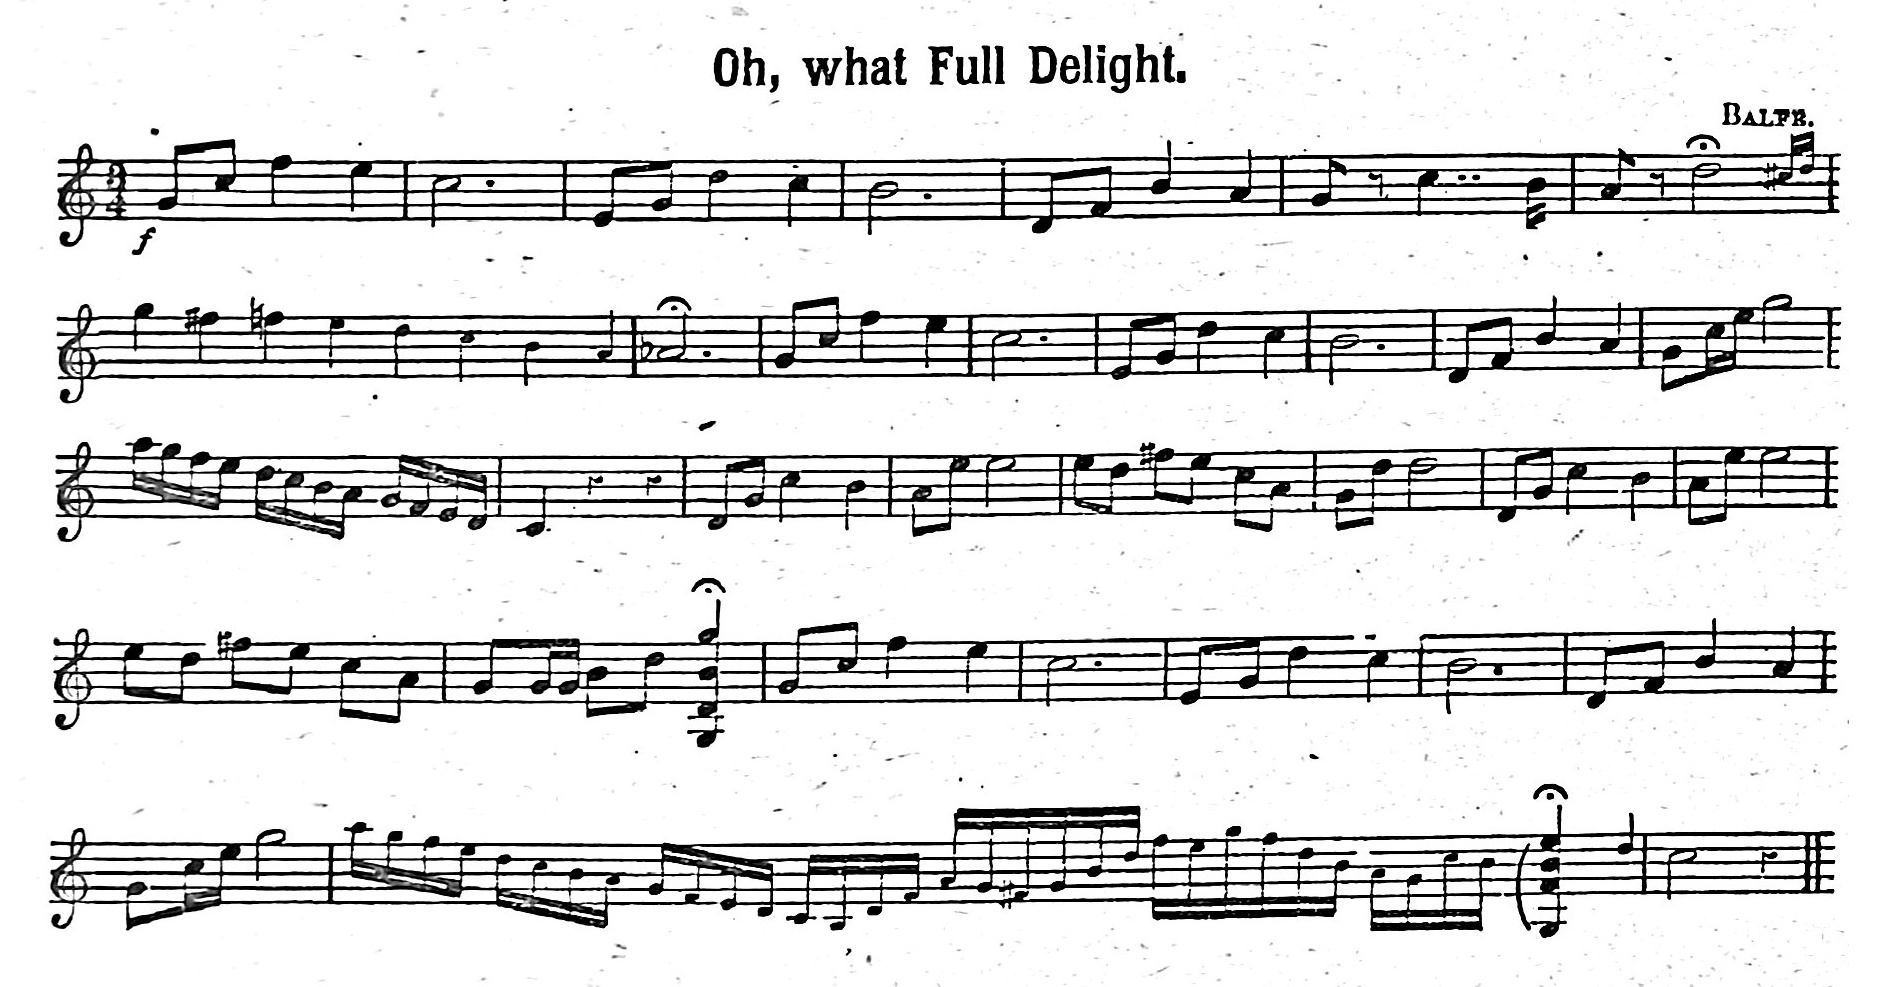 Francis & Day's Mandoline Tutor Walter Redmond Oh what full delight Balfe